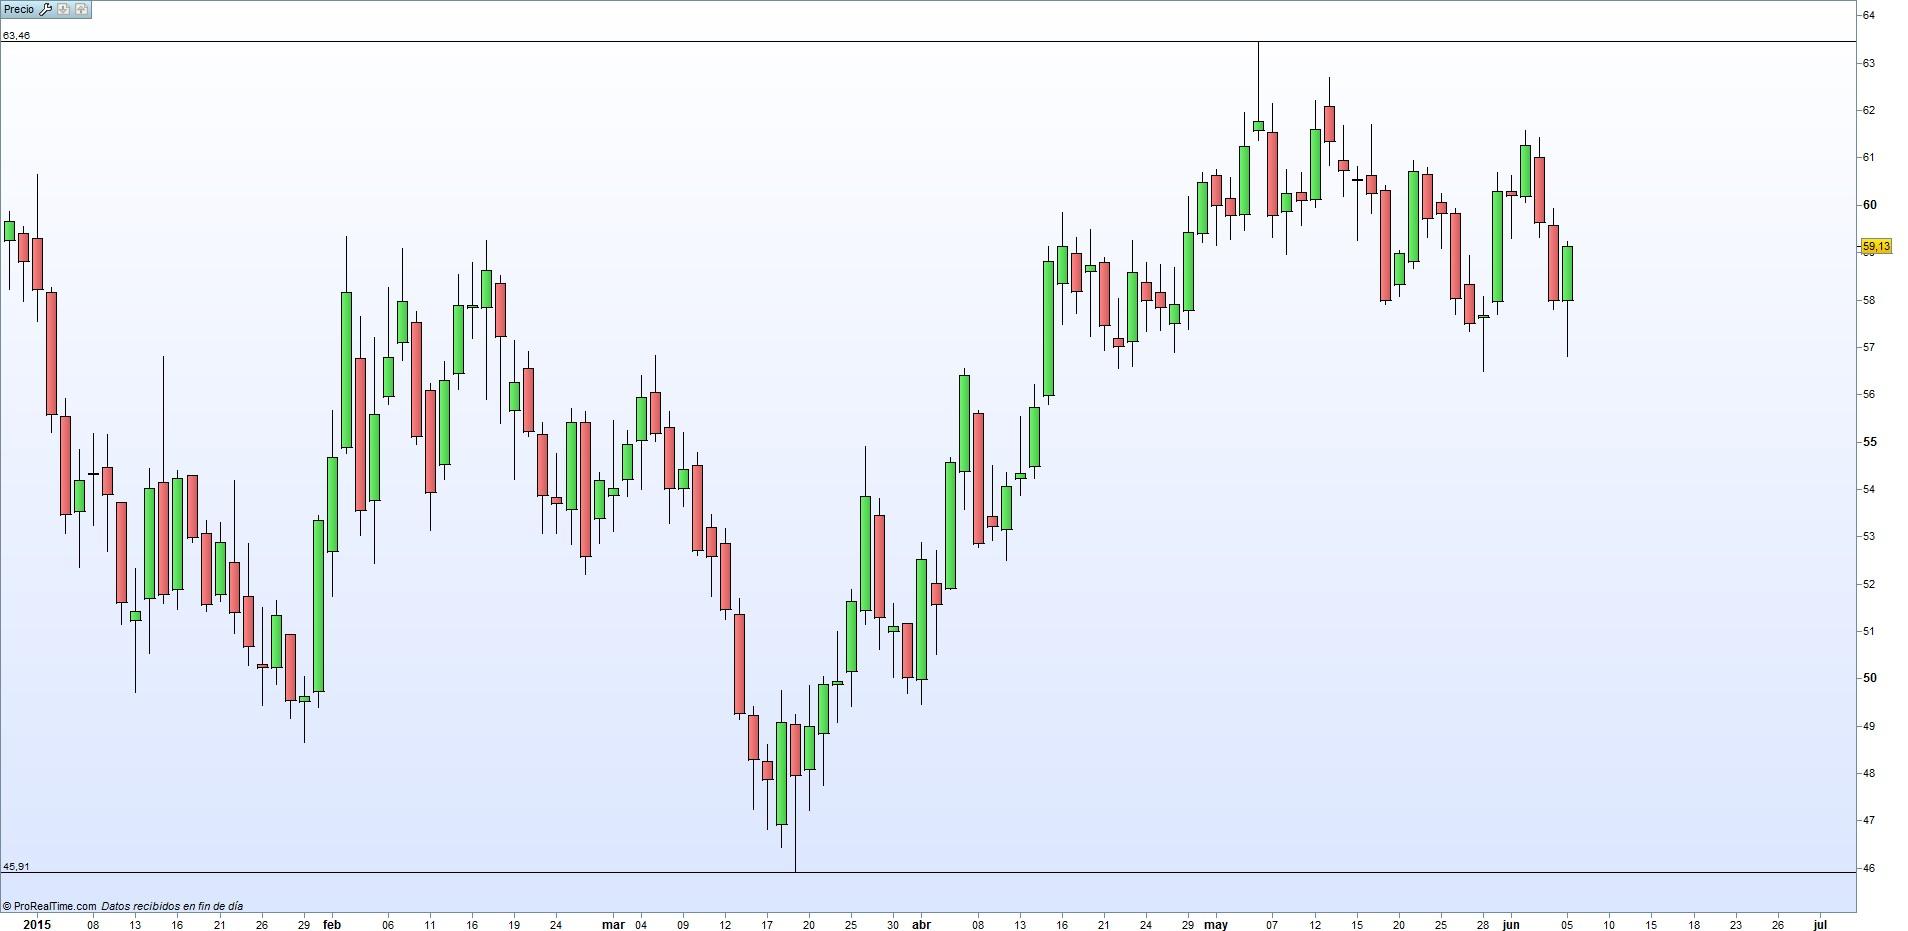 precio barril petróleo WTI